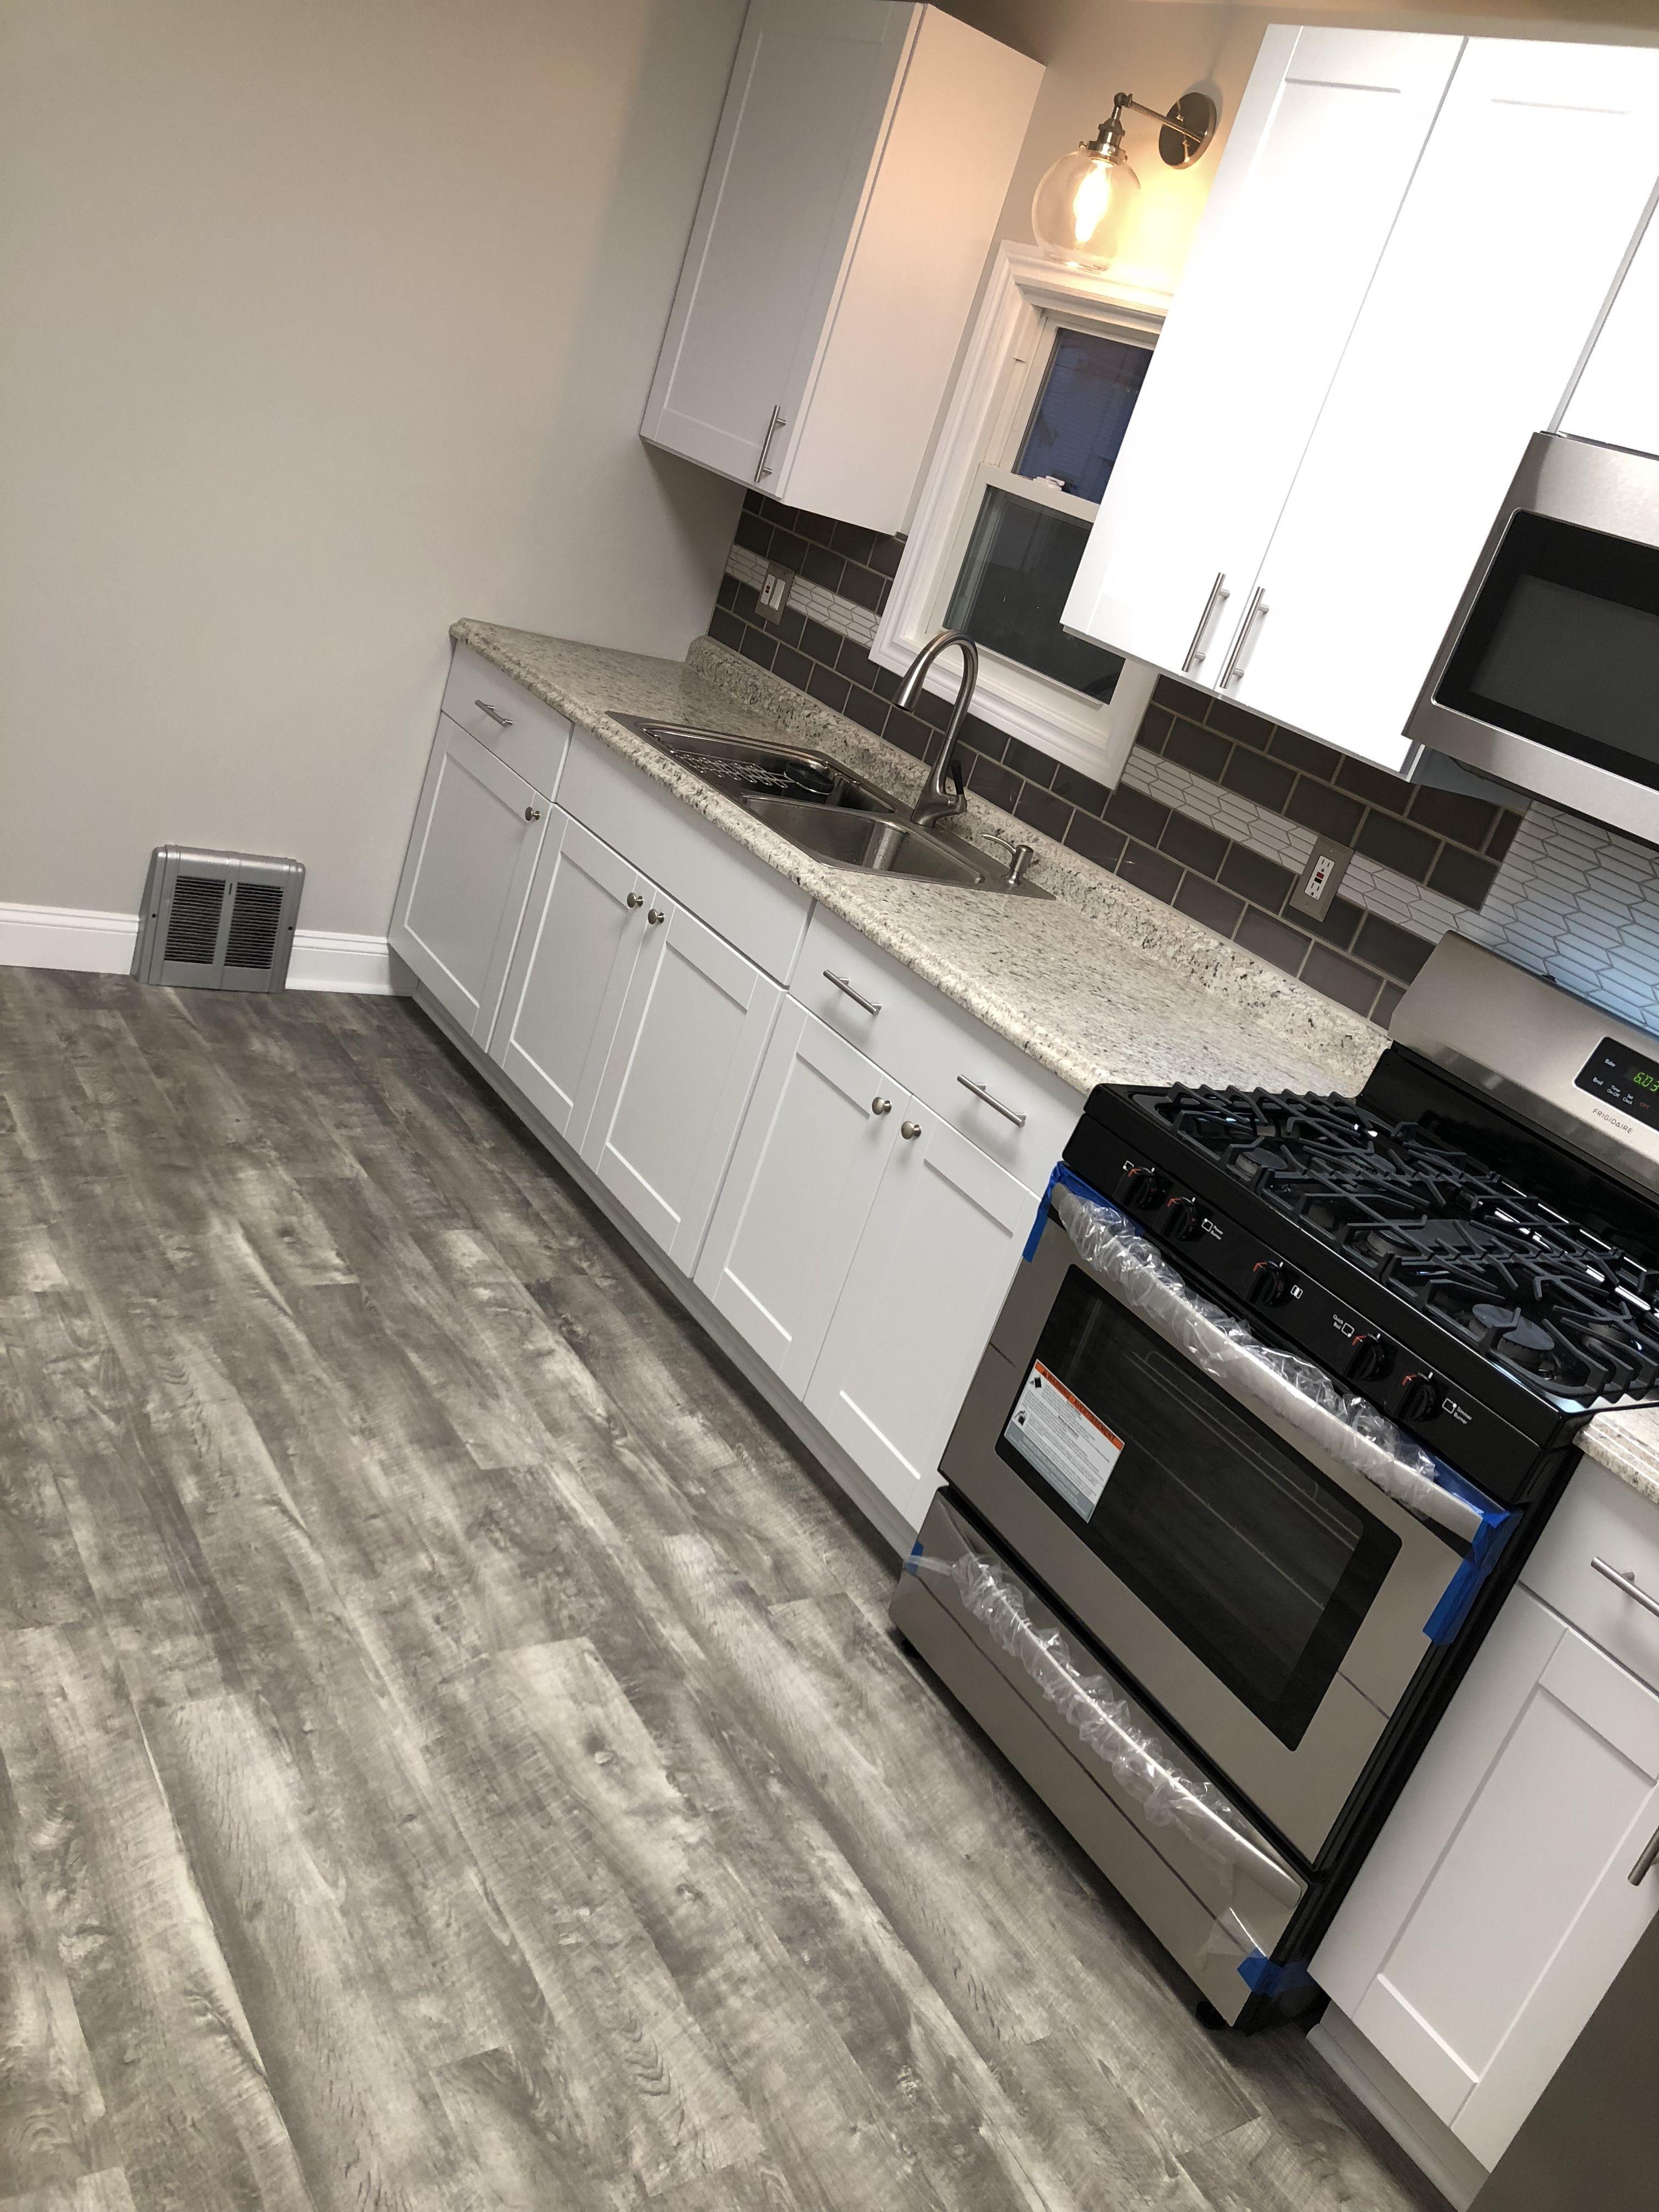 Home decorators Stony oak grey vinyl plank flooring. White